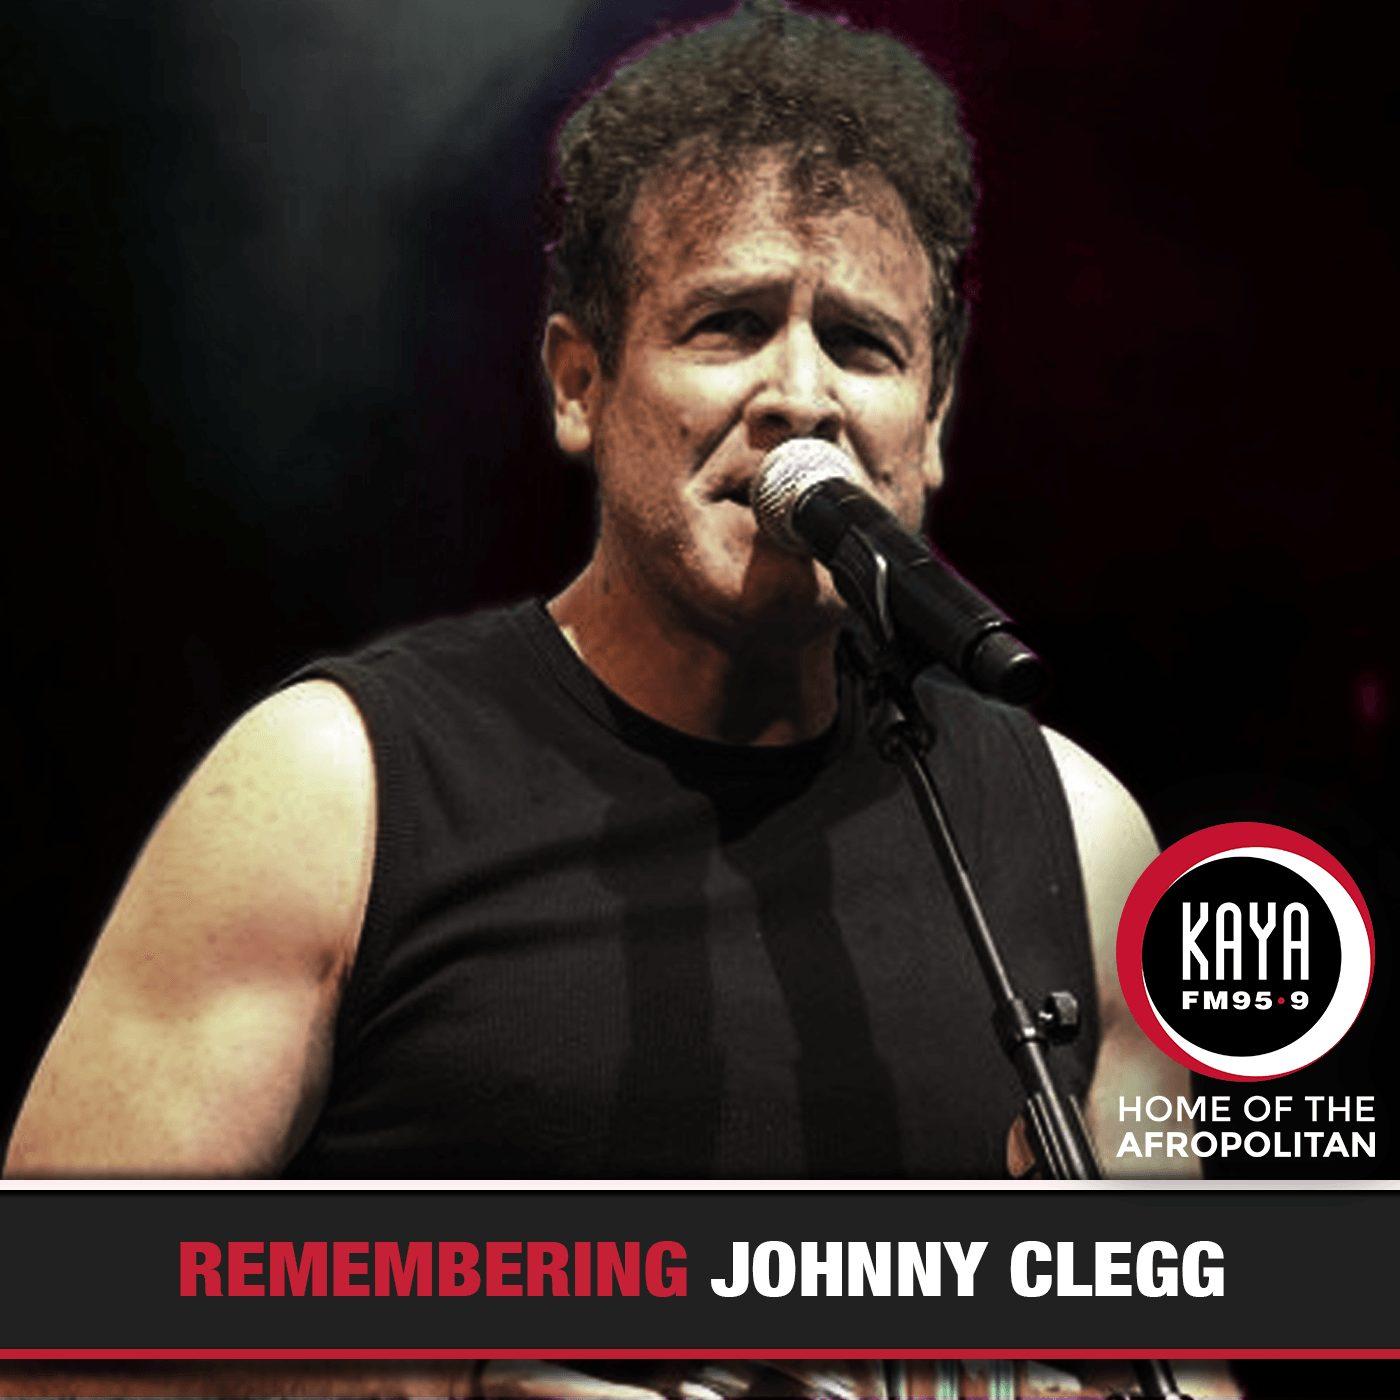 kaya fm legend tributes, Johnny Clegg,